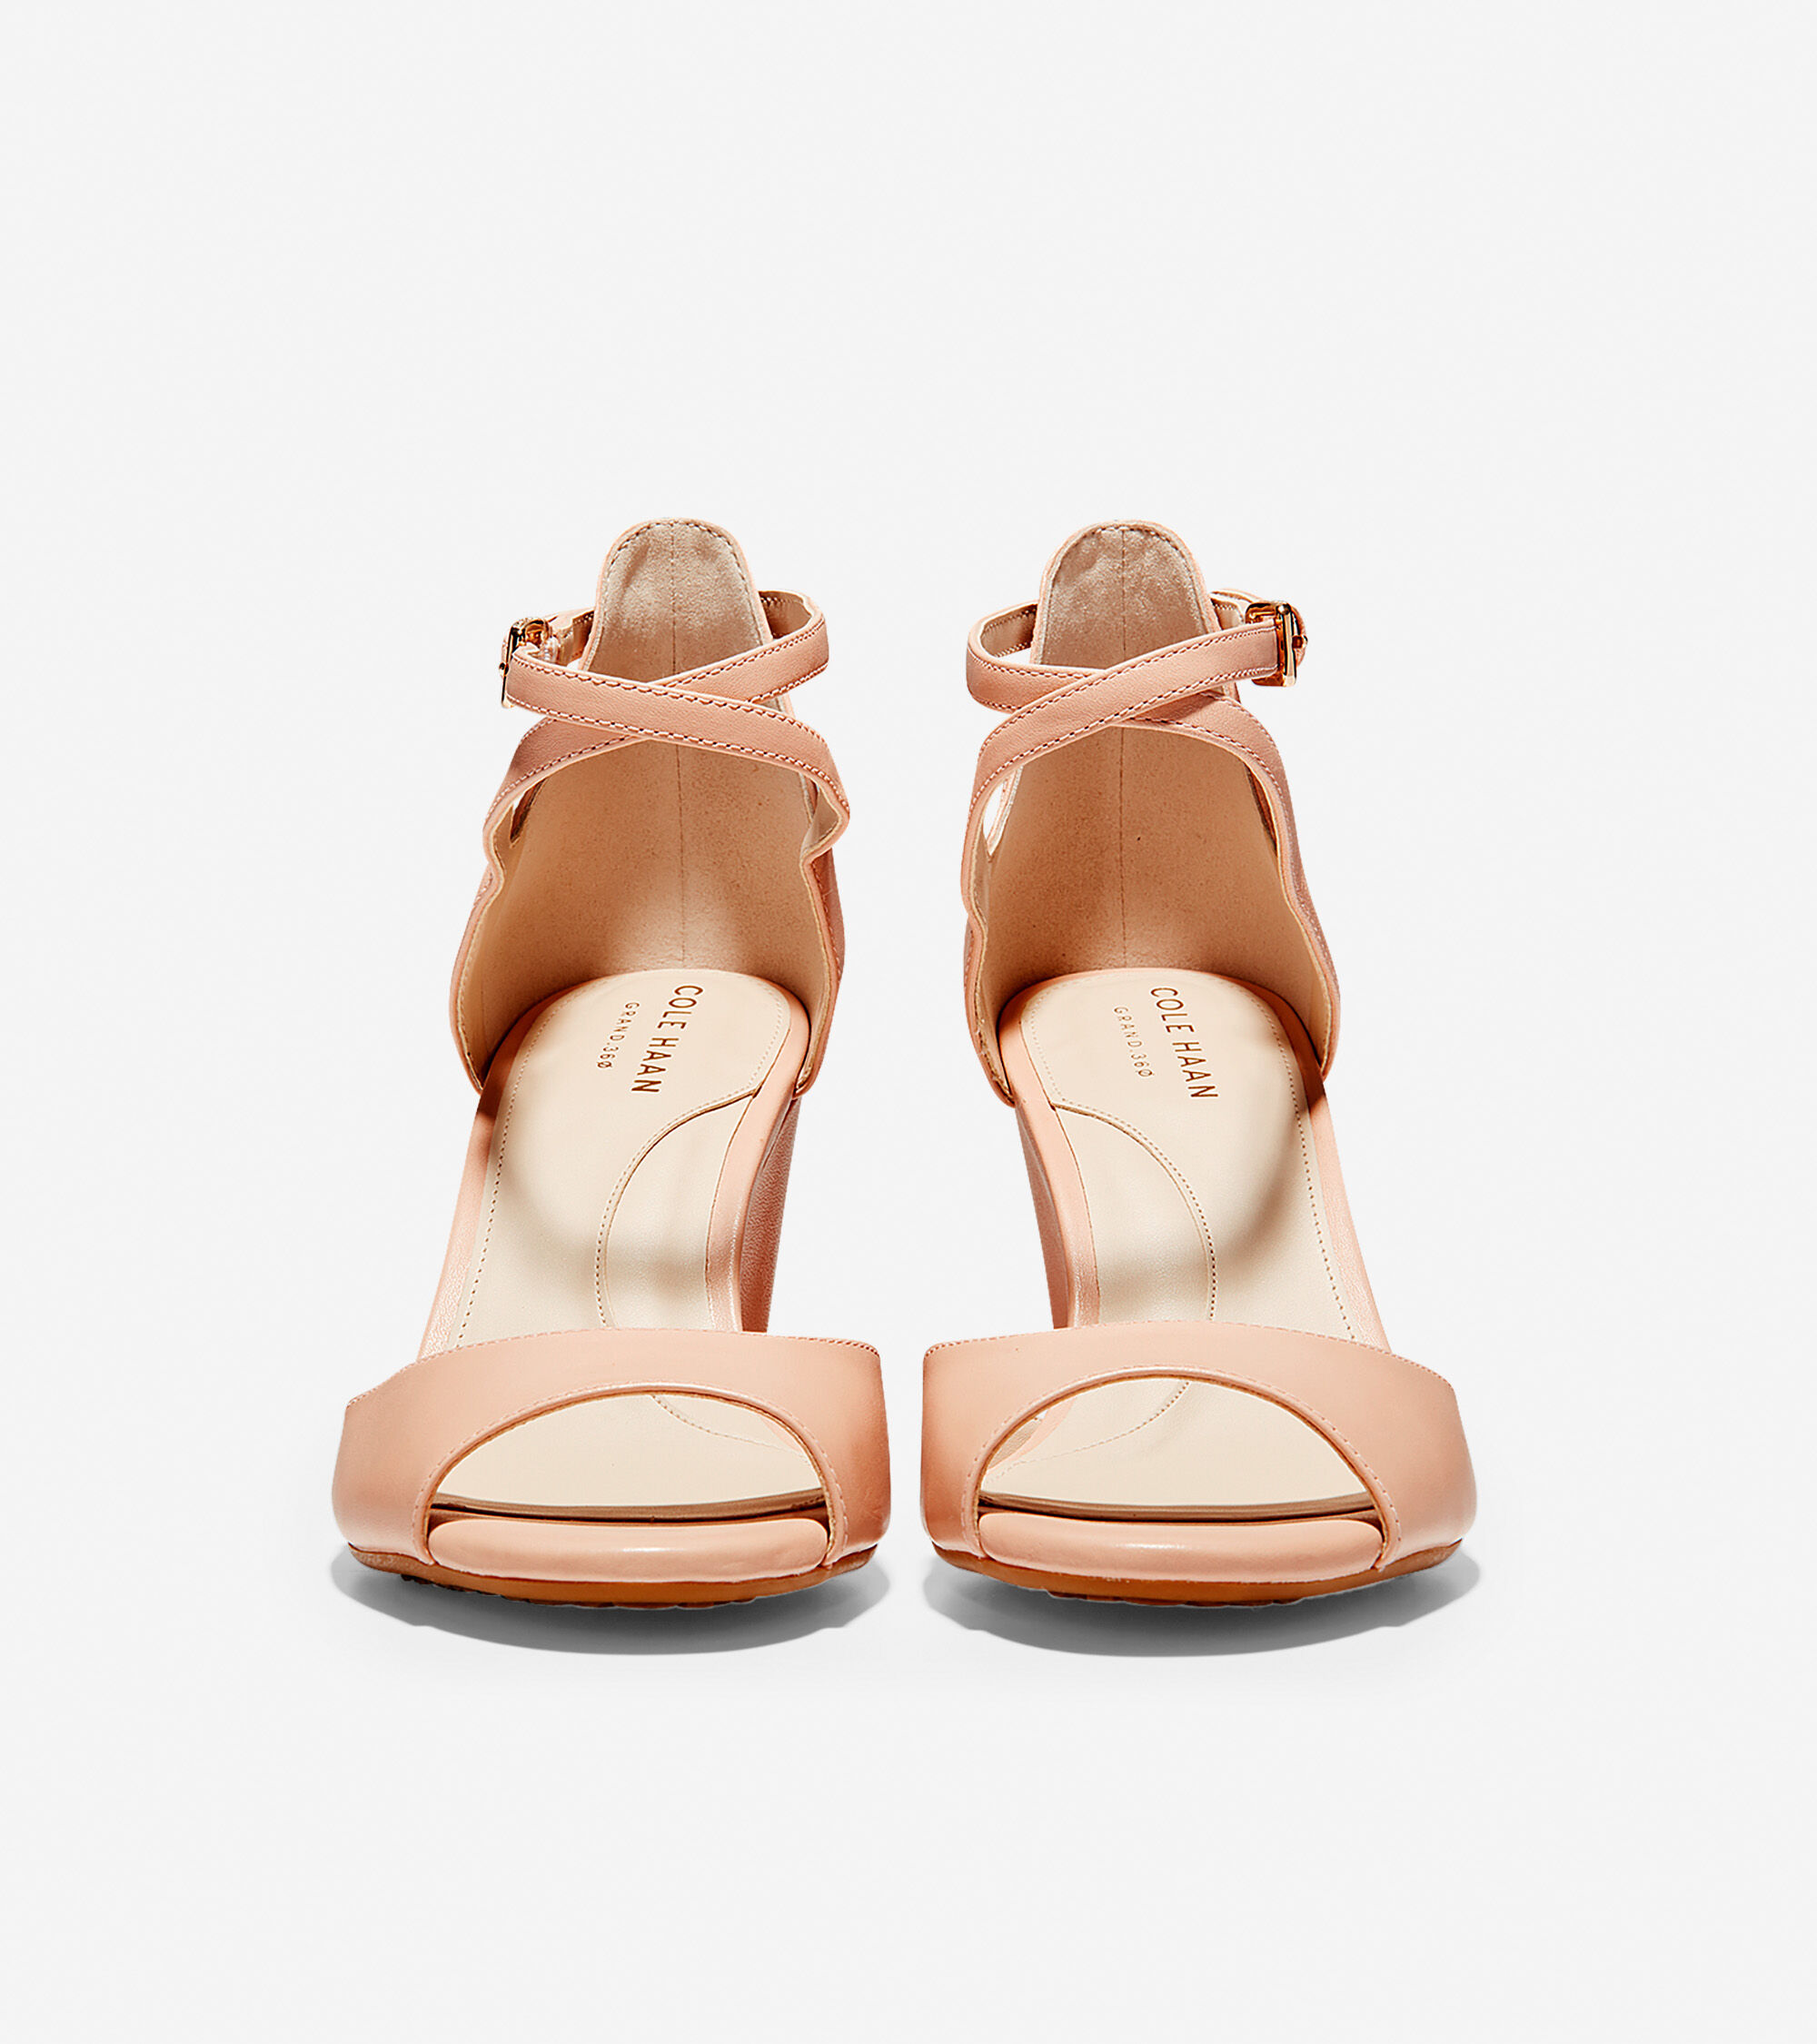 3fe9a12b9d6 Women s Sadie Open Toe Wedge Sandals 75MM in Mahogany Rose